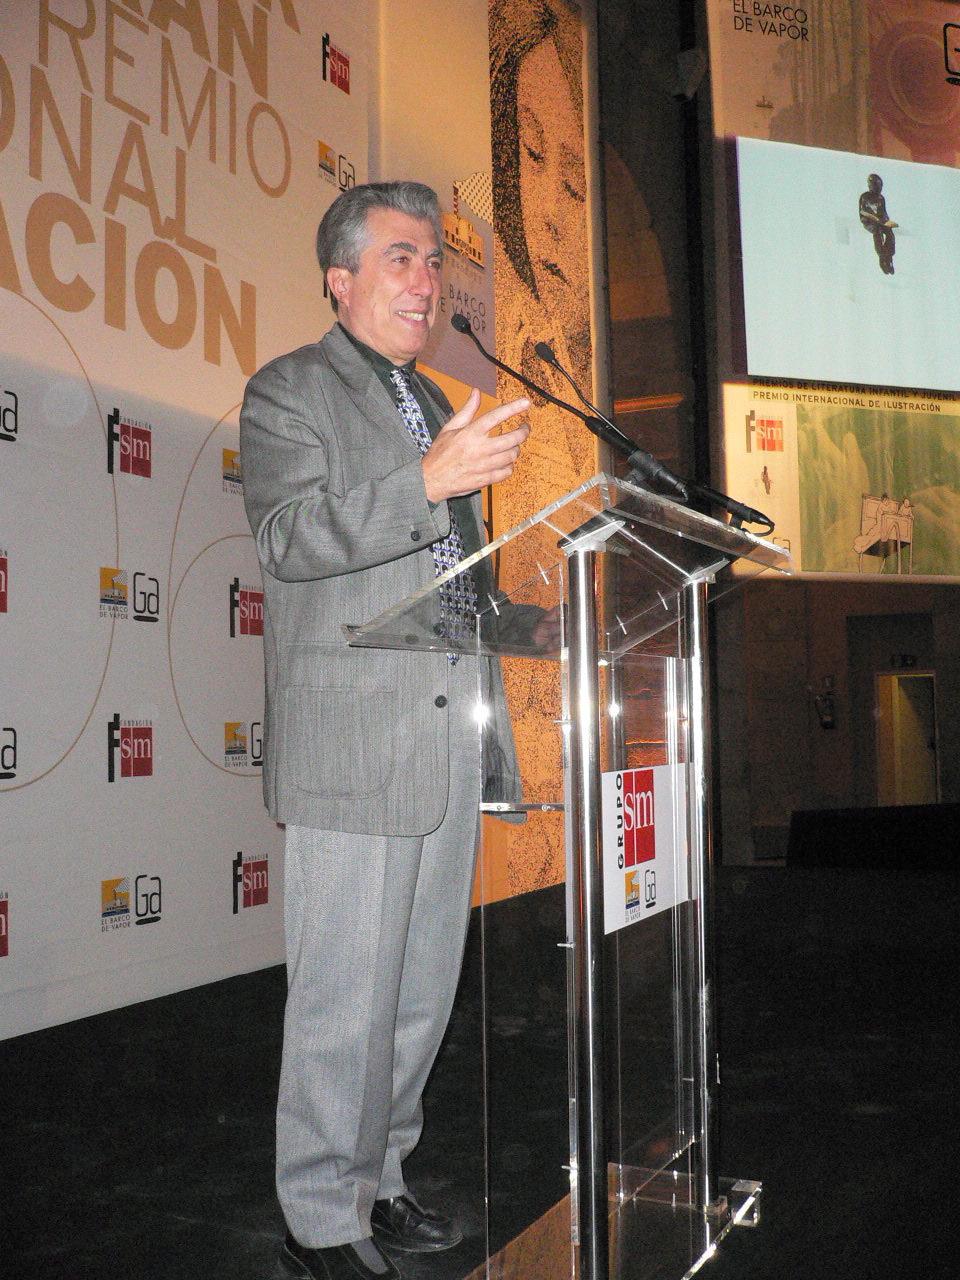 http://www.sierraifabra.com/ant/fotos/Image/Privado/Yo%20discurso.JPG